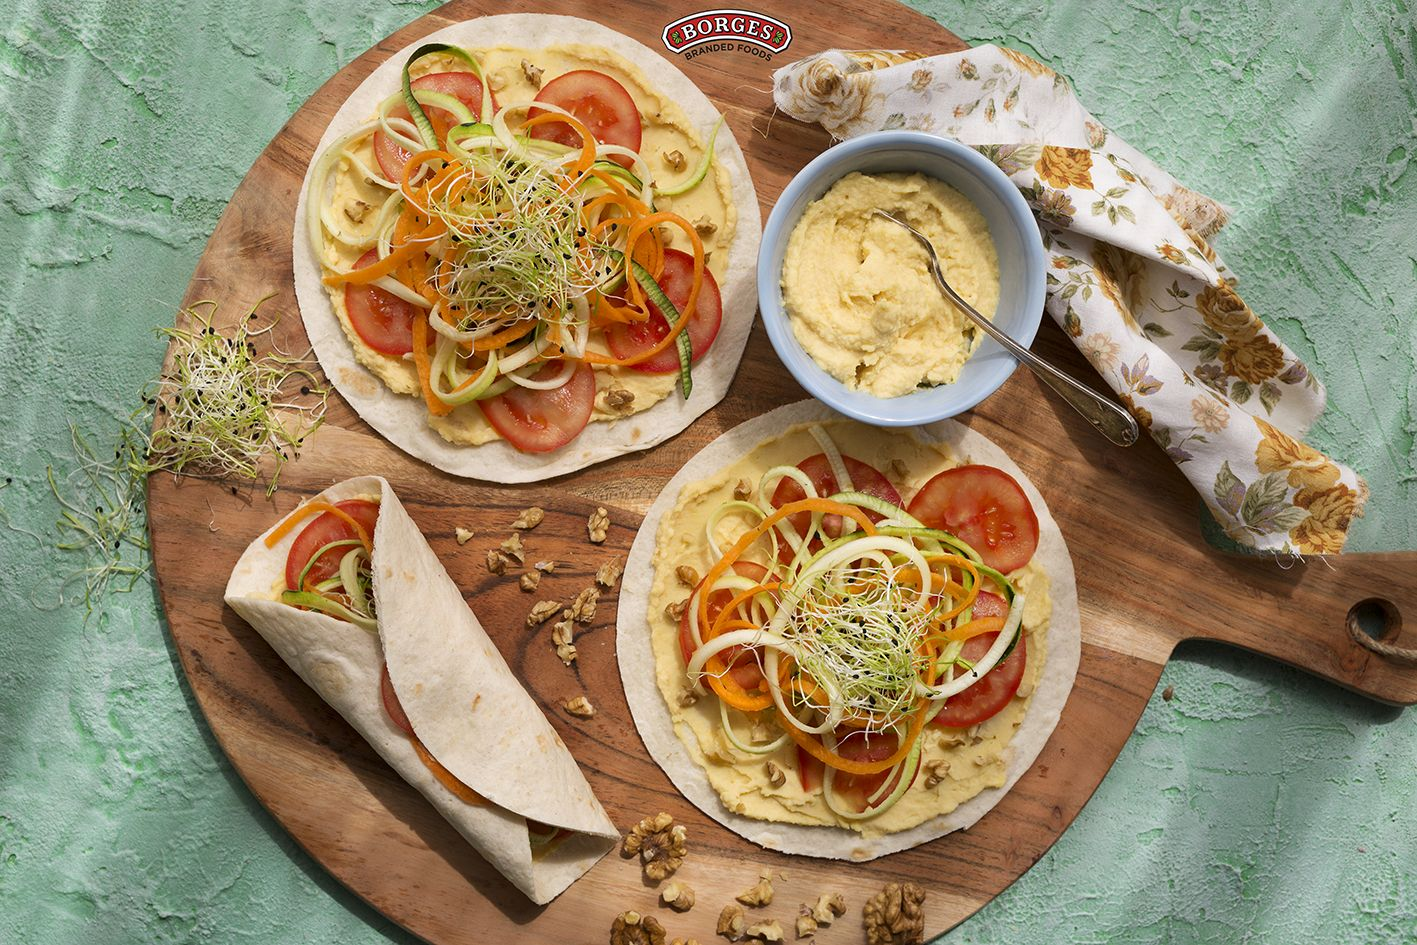 Wrap z rajčete, zeleninových špaget, hummusu a klíčků